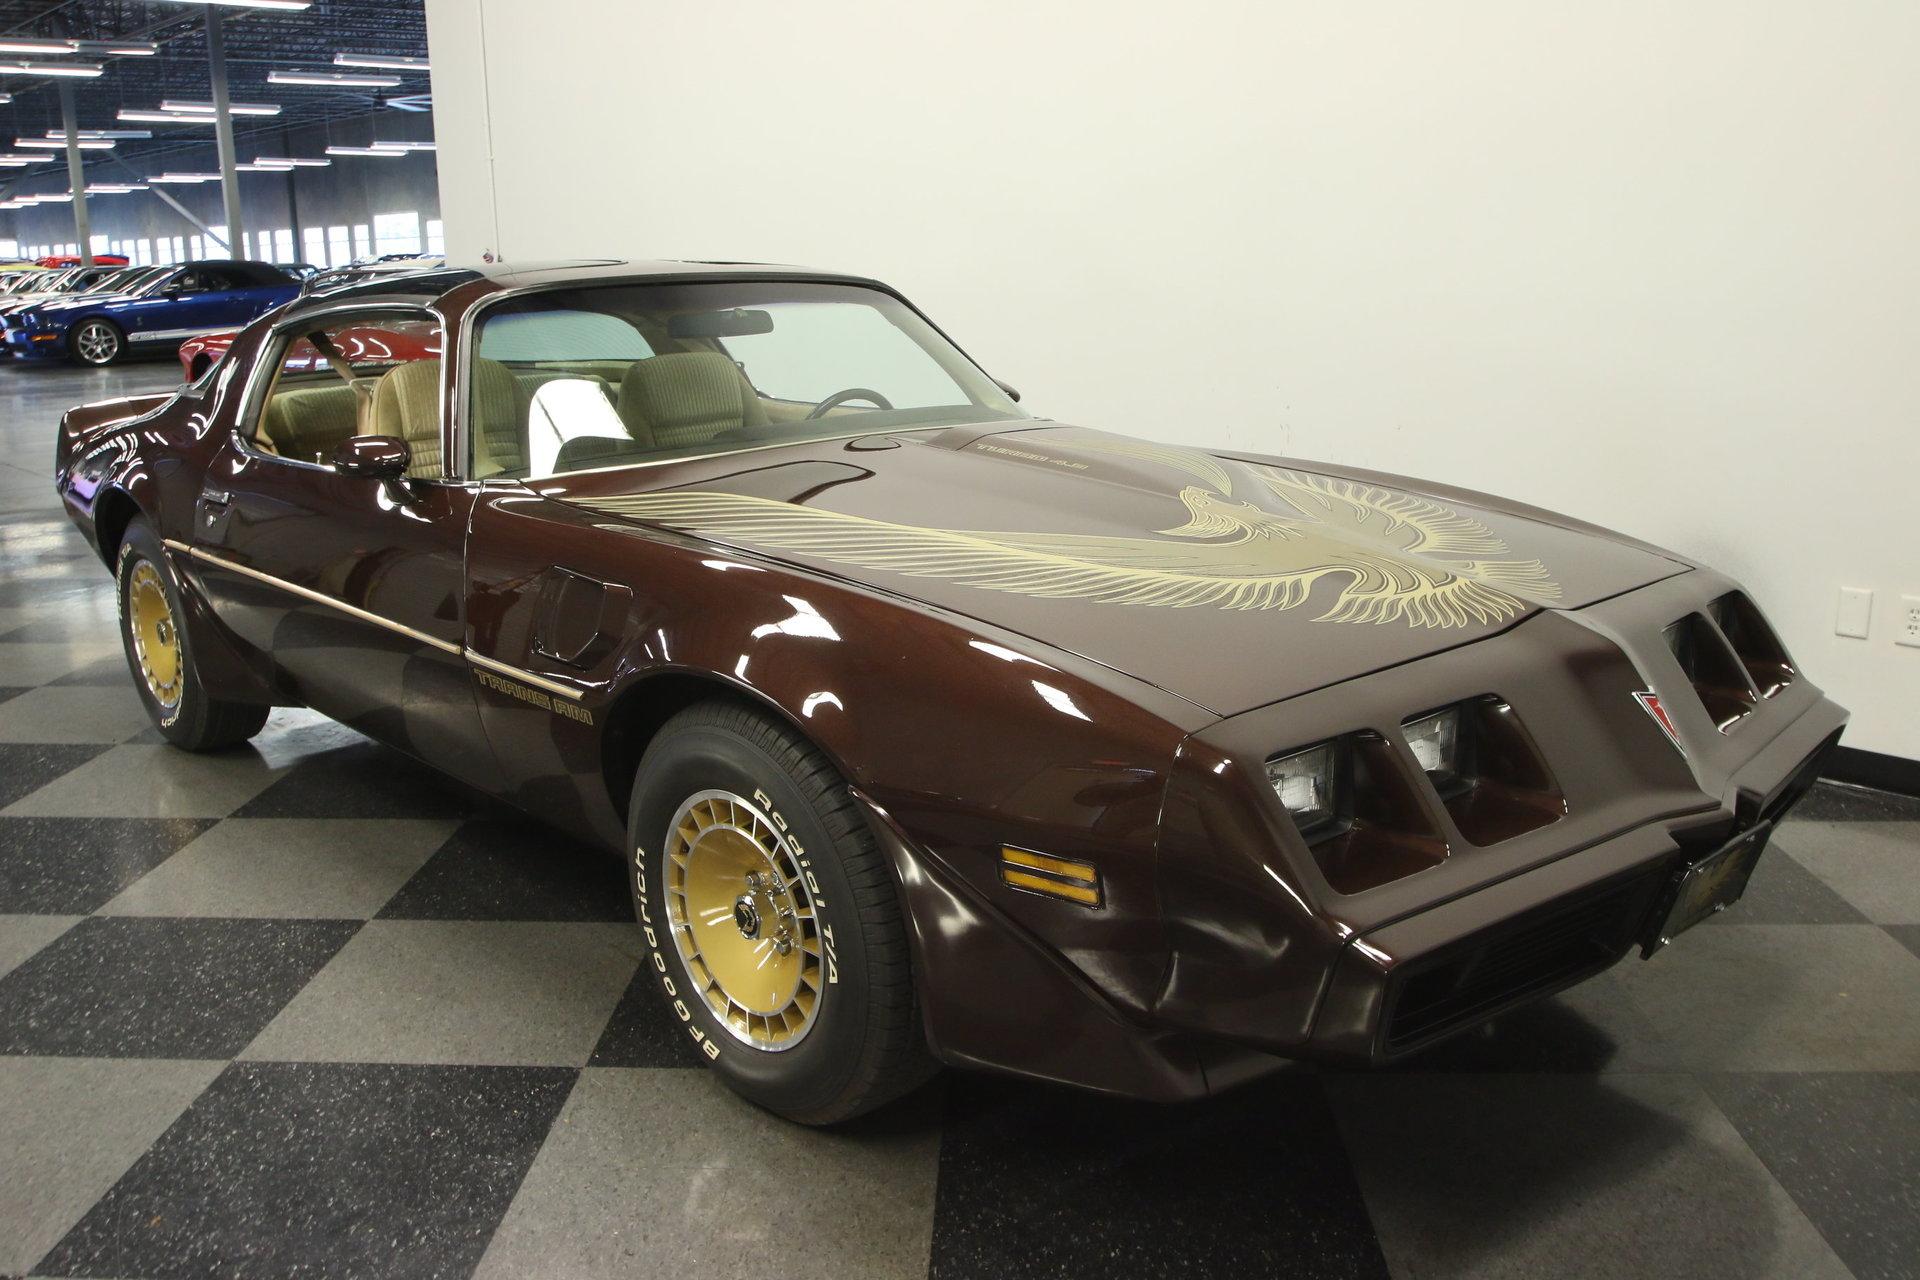 1981 pontiac firebird trans am turbo ws6 for sale 98167 mcg. Black Bedroom Furniture Sets. Home Design Ideas